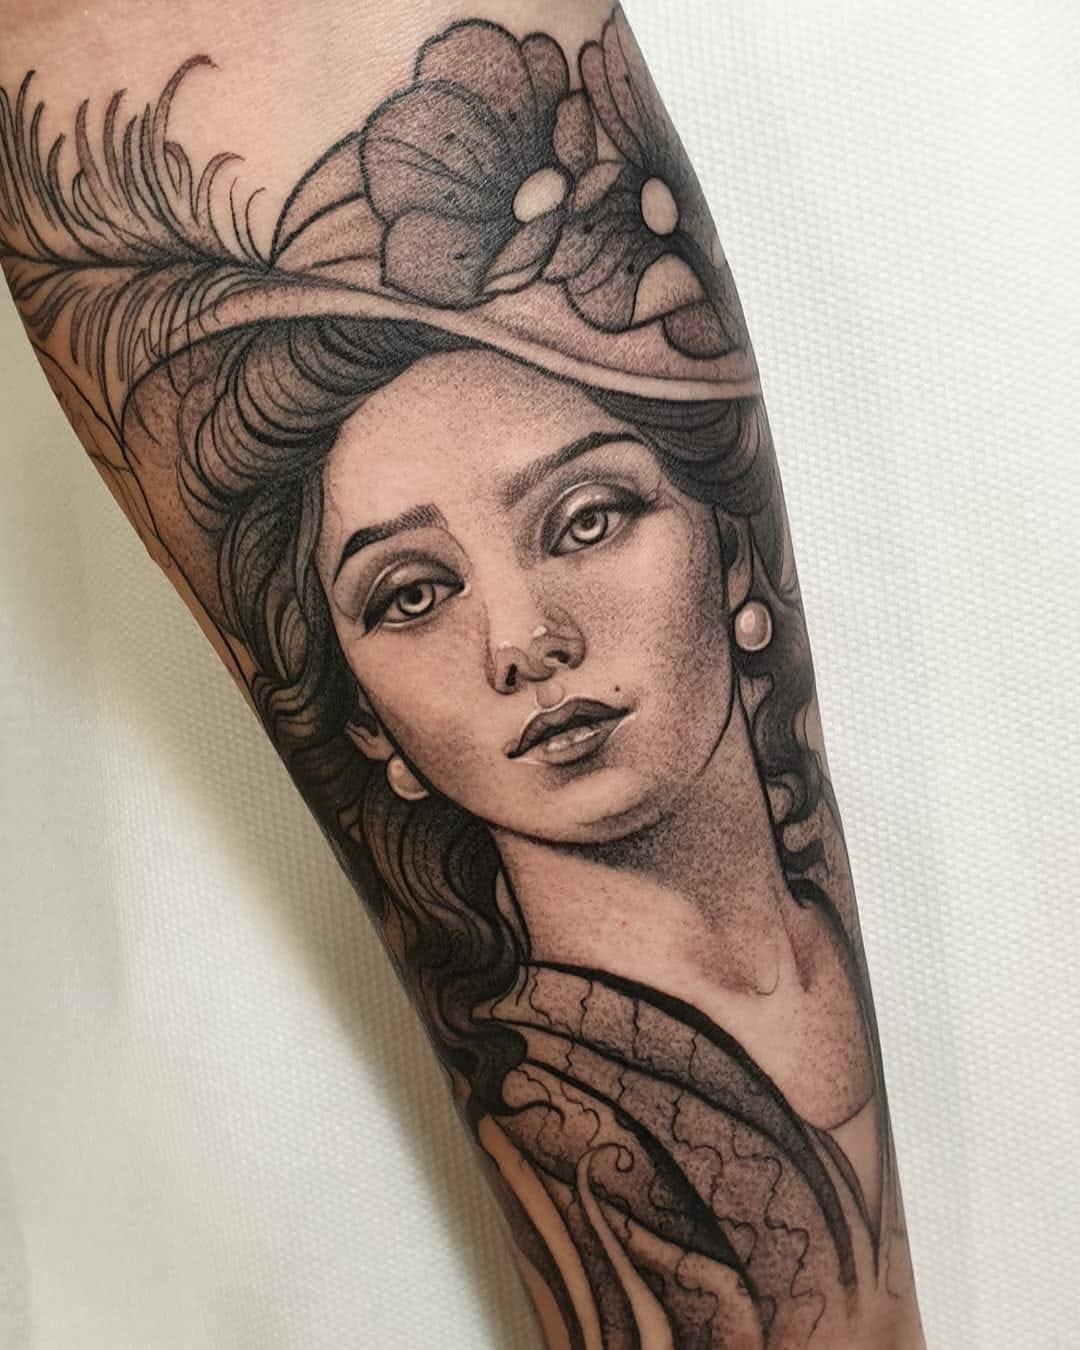 Inksearch tattoo Maria Koroleva